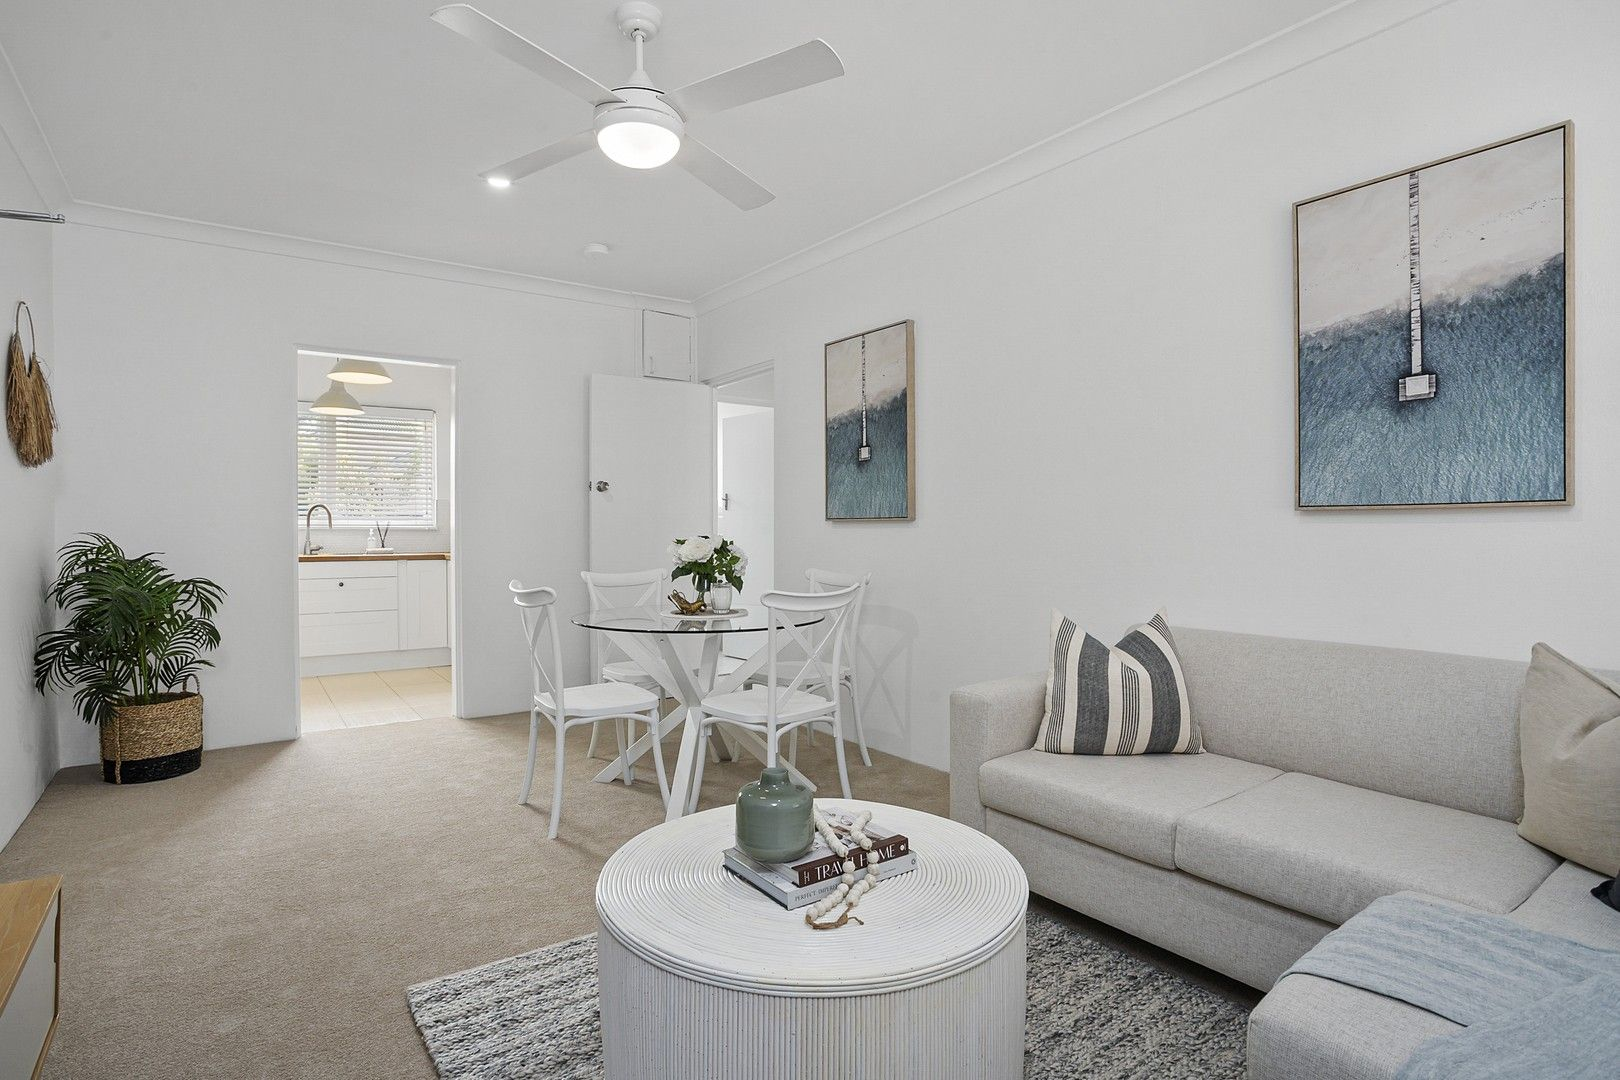 4/32 Serpentine Crescent, North Balgowlah NSW 2093, Image 0